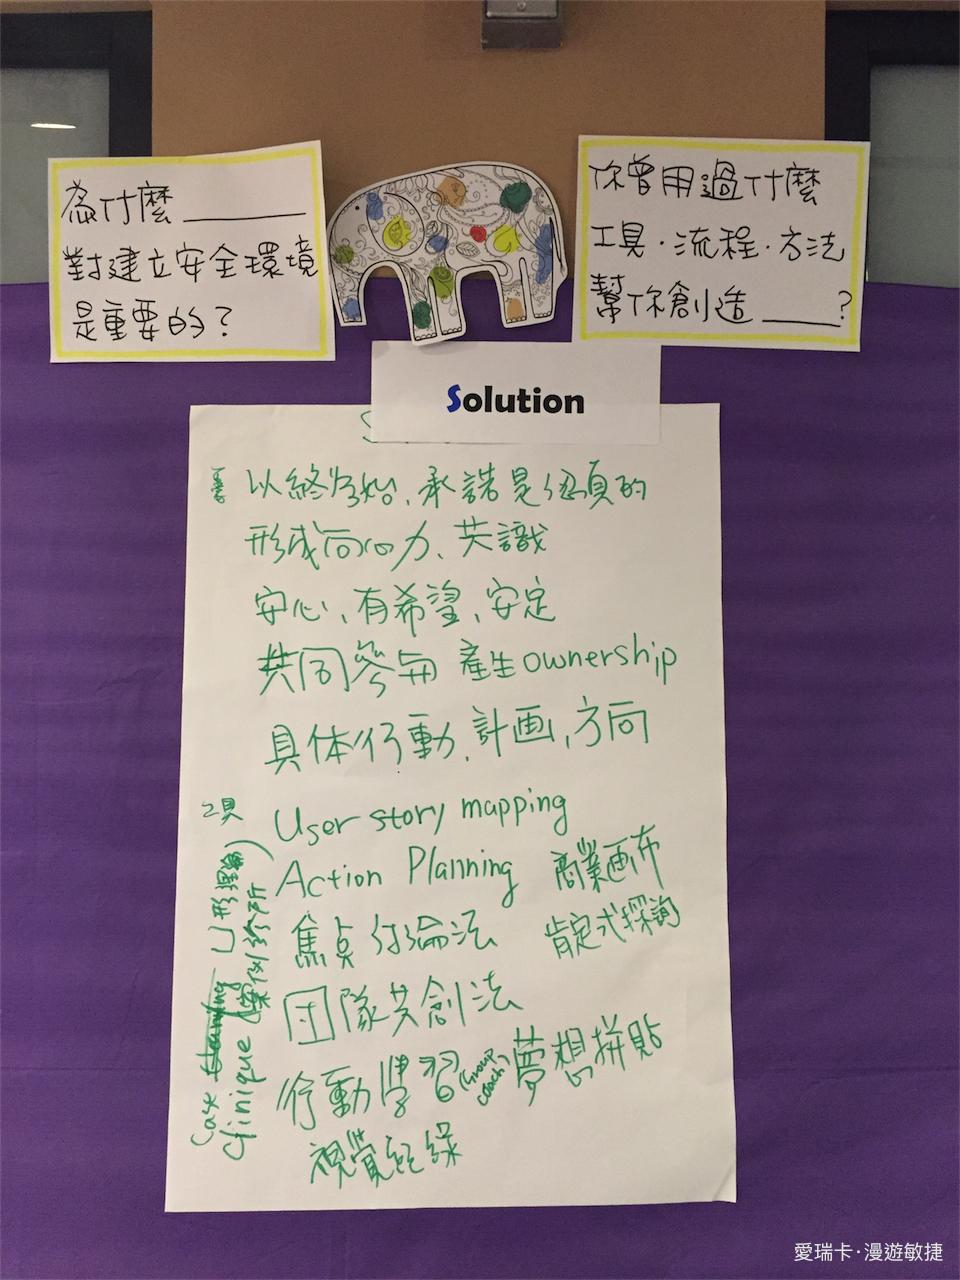 5-solution_2016-10-19-127